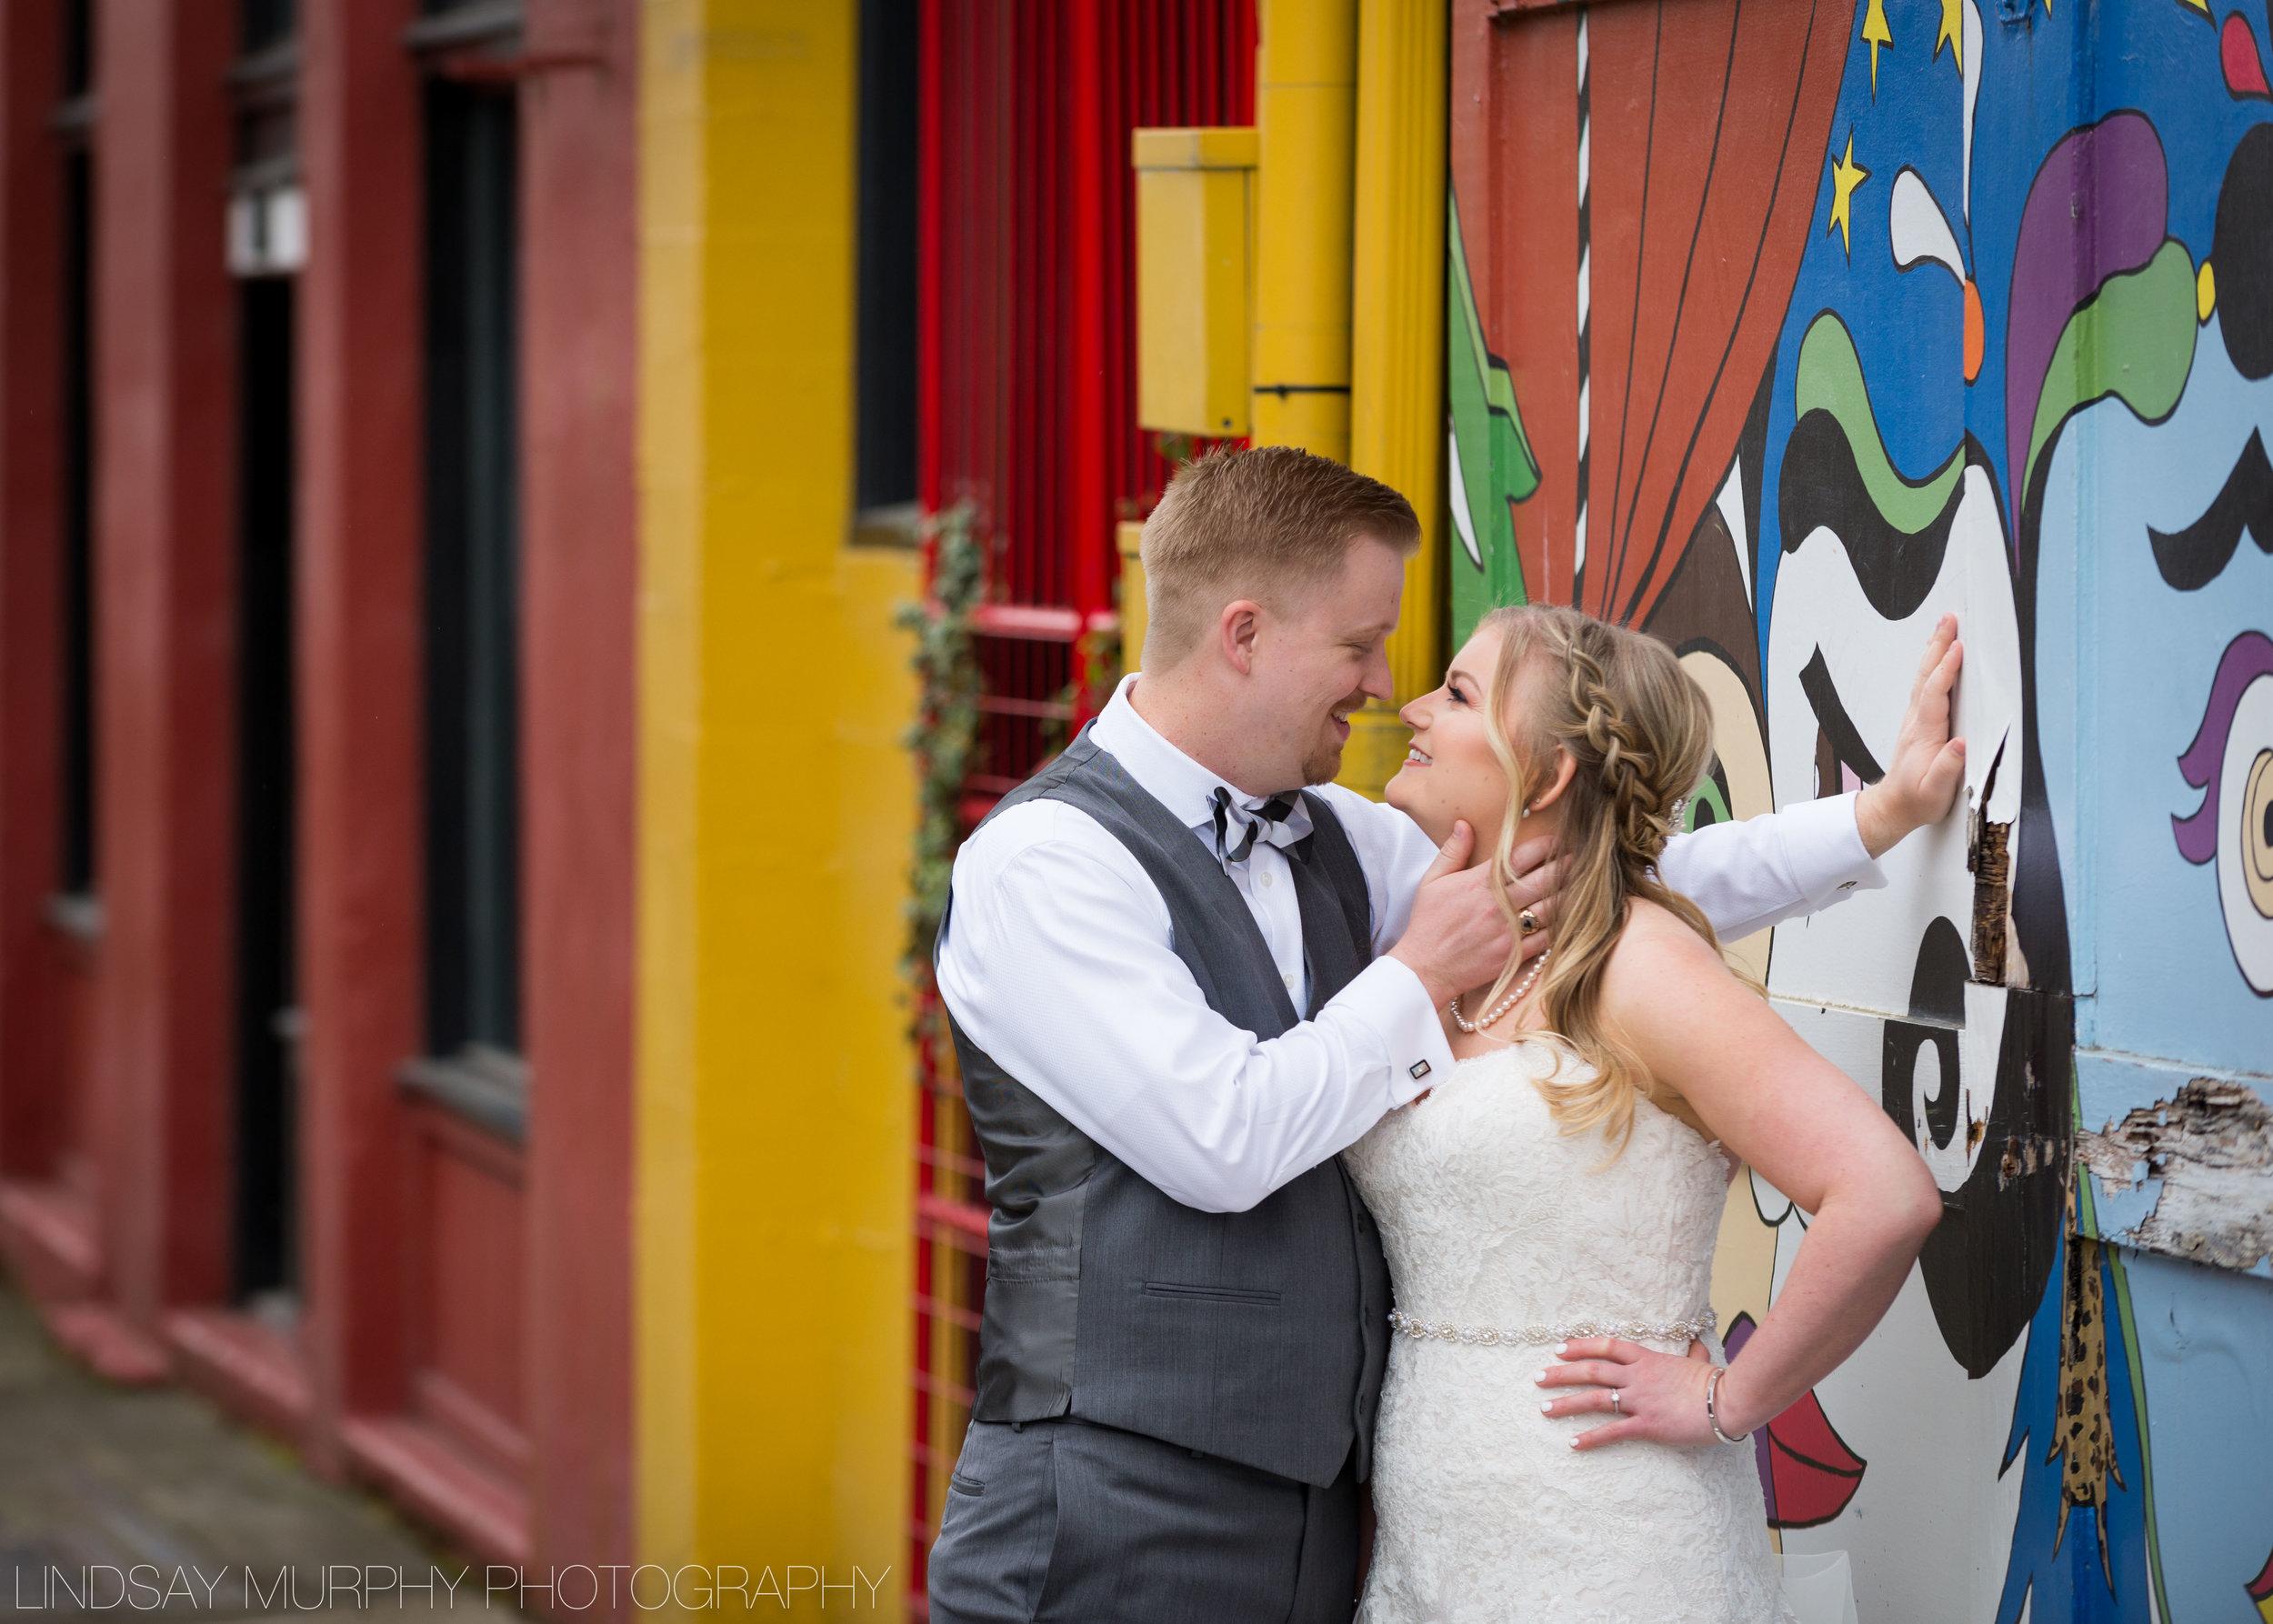 Tacoma_Wedding_photography-57.jpg